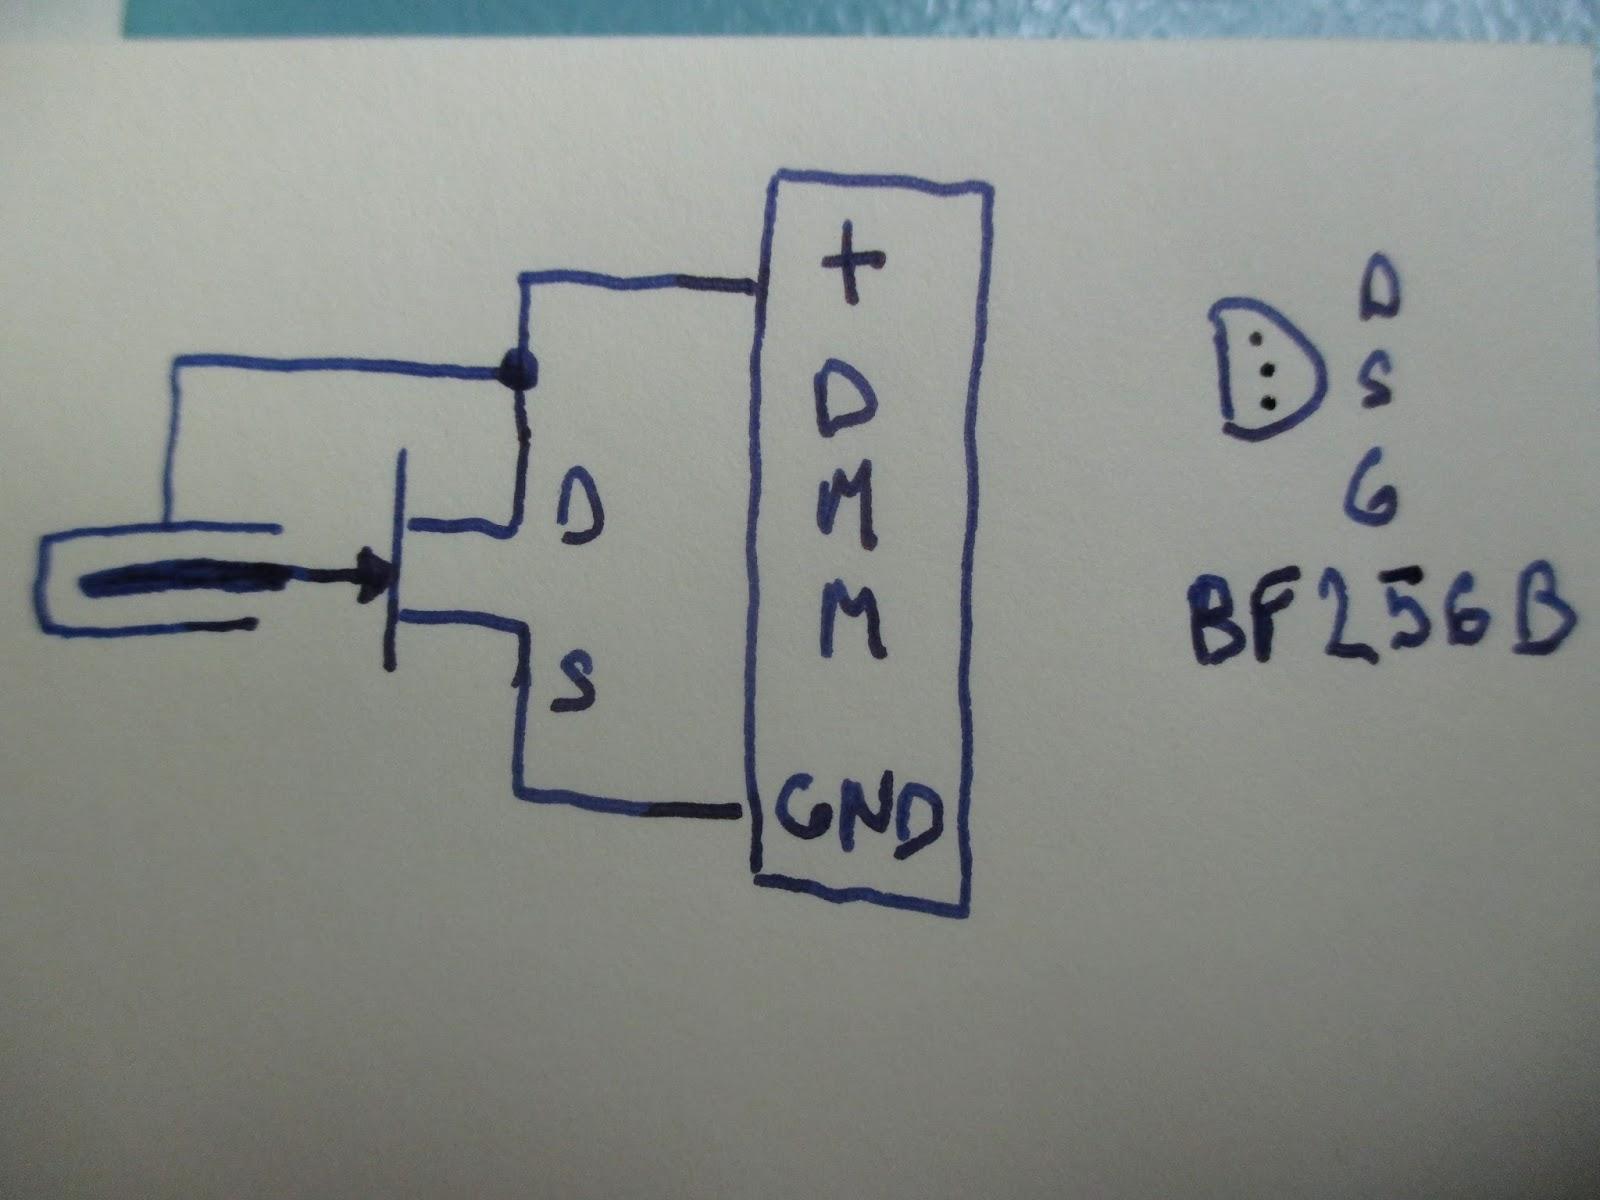 Diagram Radioactivity detection using very simple ionization chamber